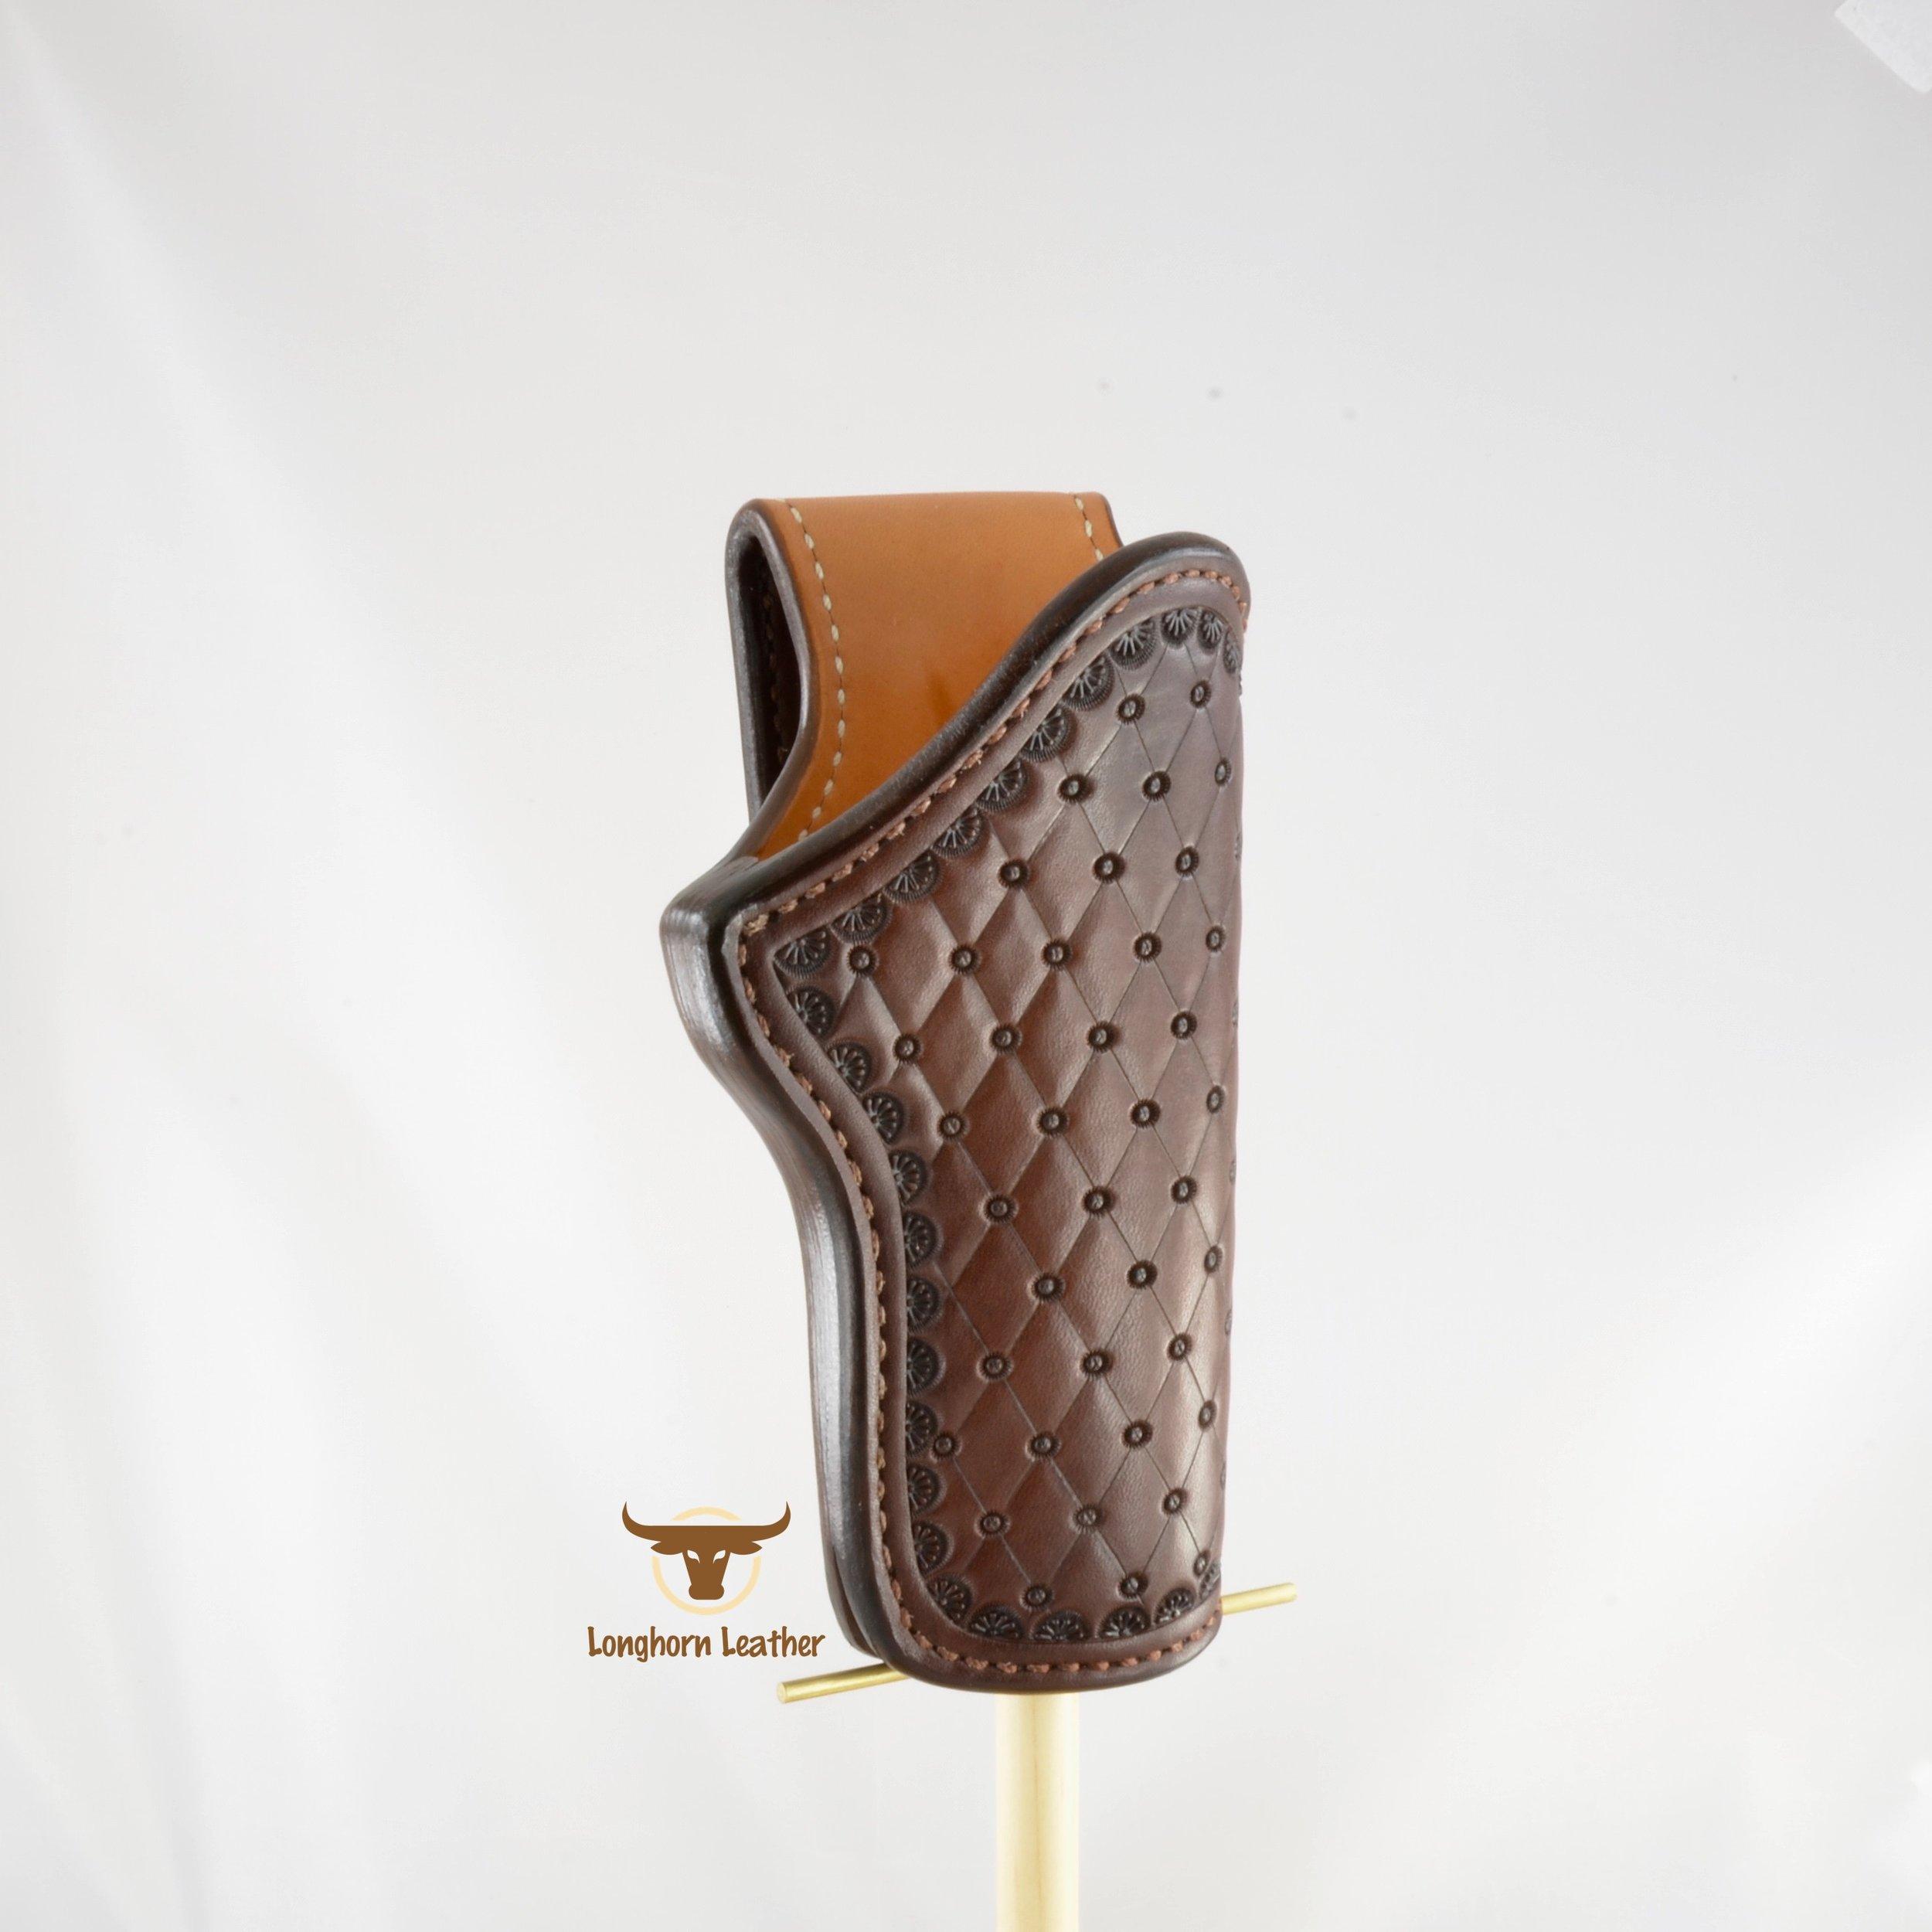 Longhorn Leather AZ - 1911 Holster featurng the %22San Carlos%22 design 11.jpg